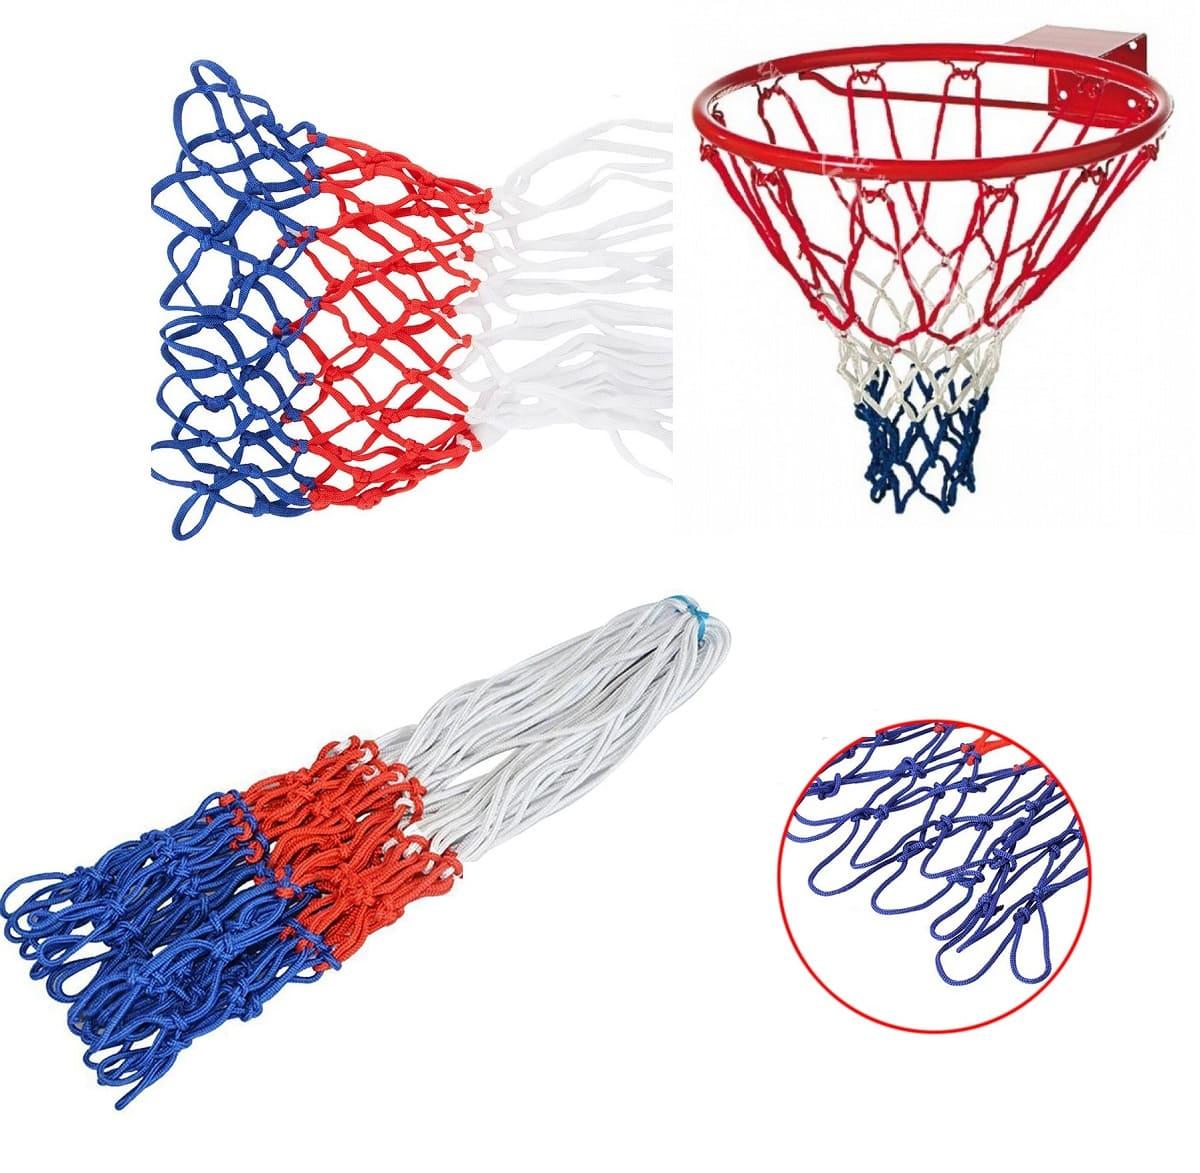 Сетка баскетбольная триколор 4,5 мм фото